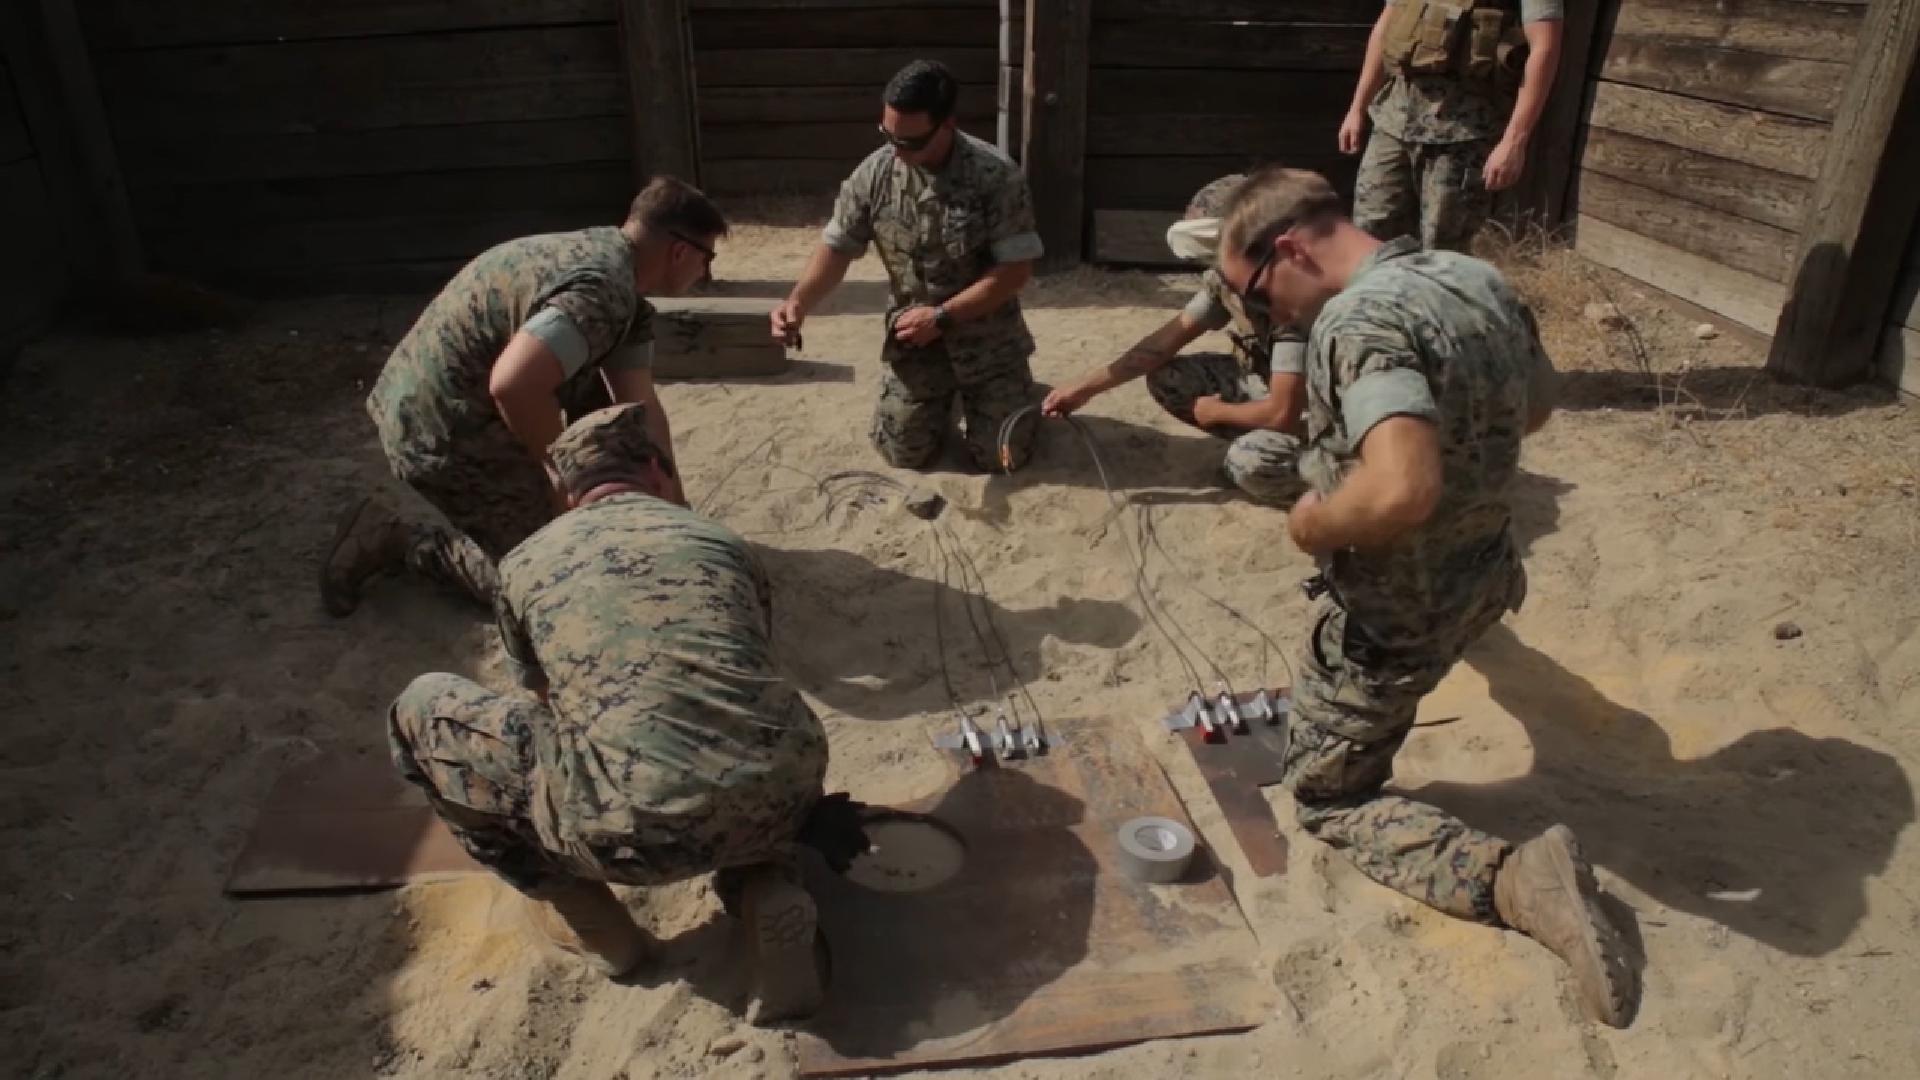 3d gedruckter sprengstoff us marines4 - Neue US-Marines Initiative testet 3D-gedruckten Sprengstoff